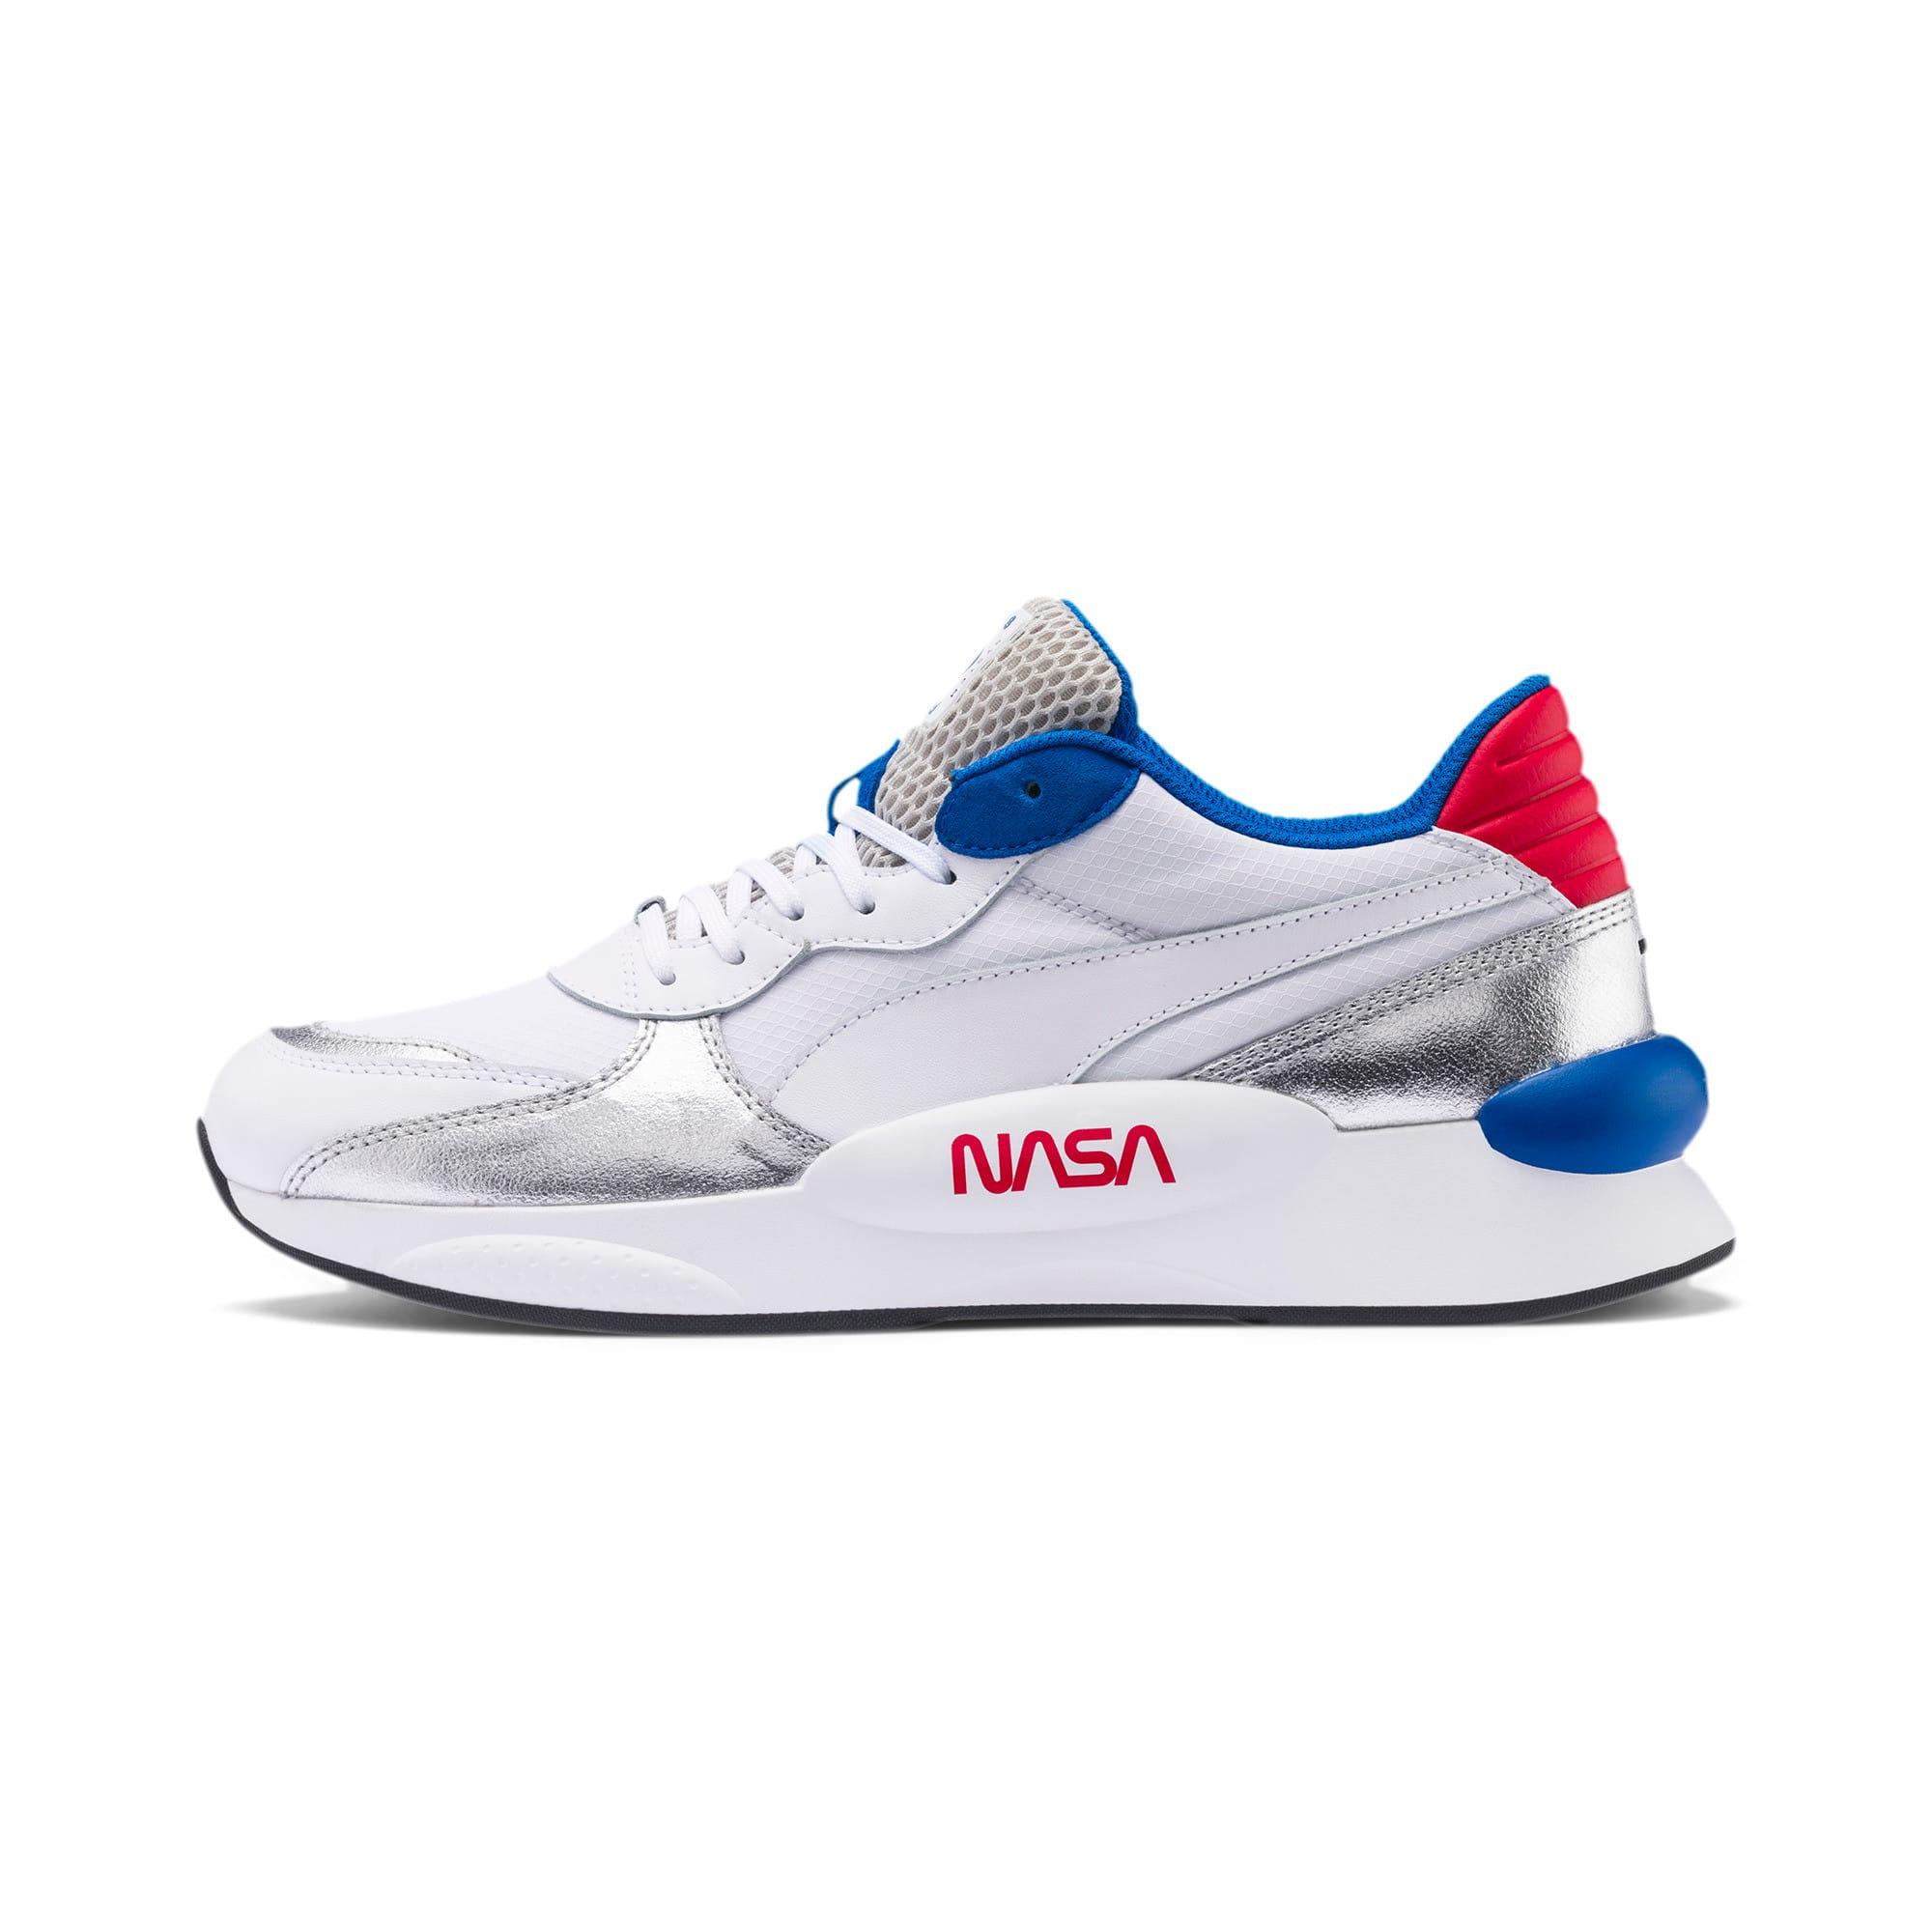 Thumbnail 1 of RS 9.8 Space Explorer Sneaker, Puma White-Puma Silver, medium